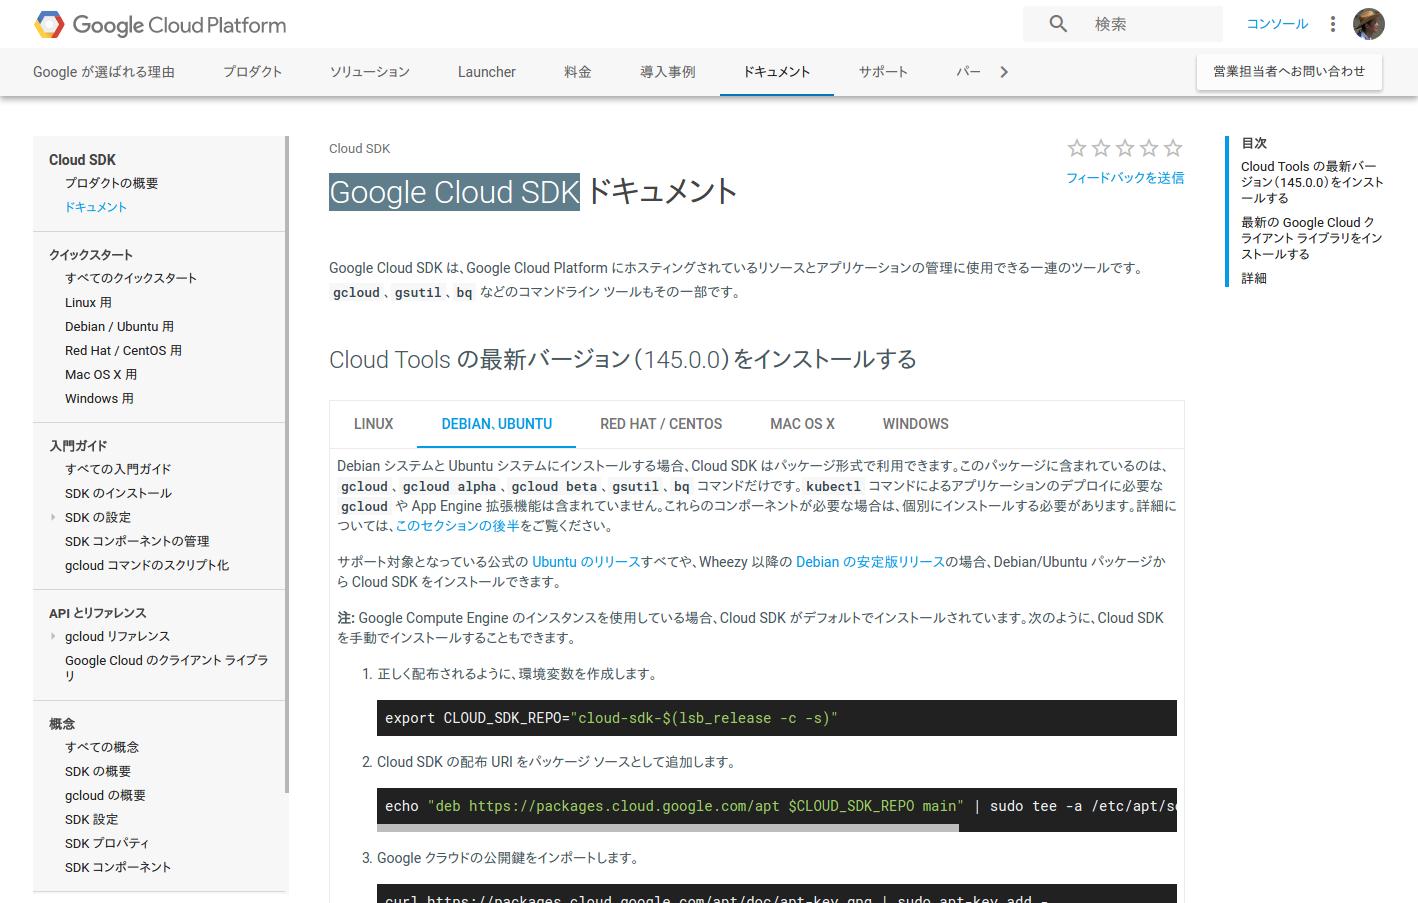 Google Cloud SDK ドキュメント   Cloud SDK   Google Cloud Platform.png